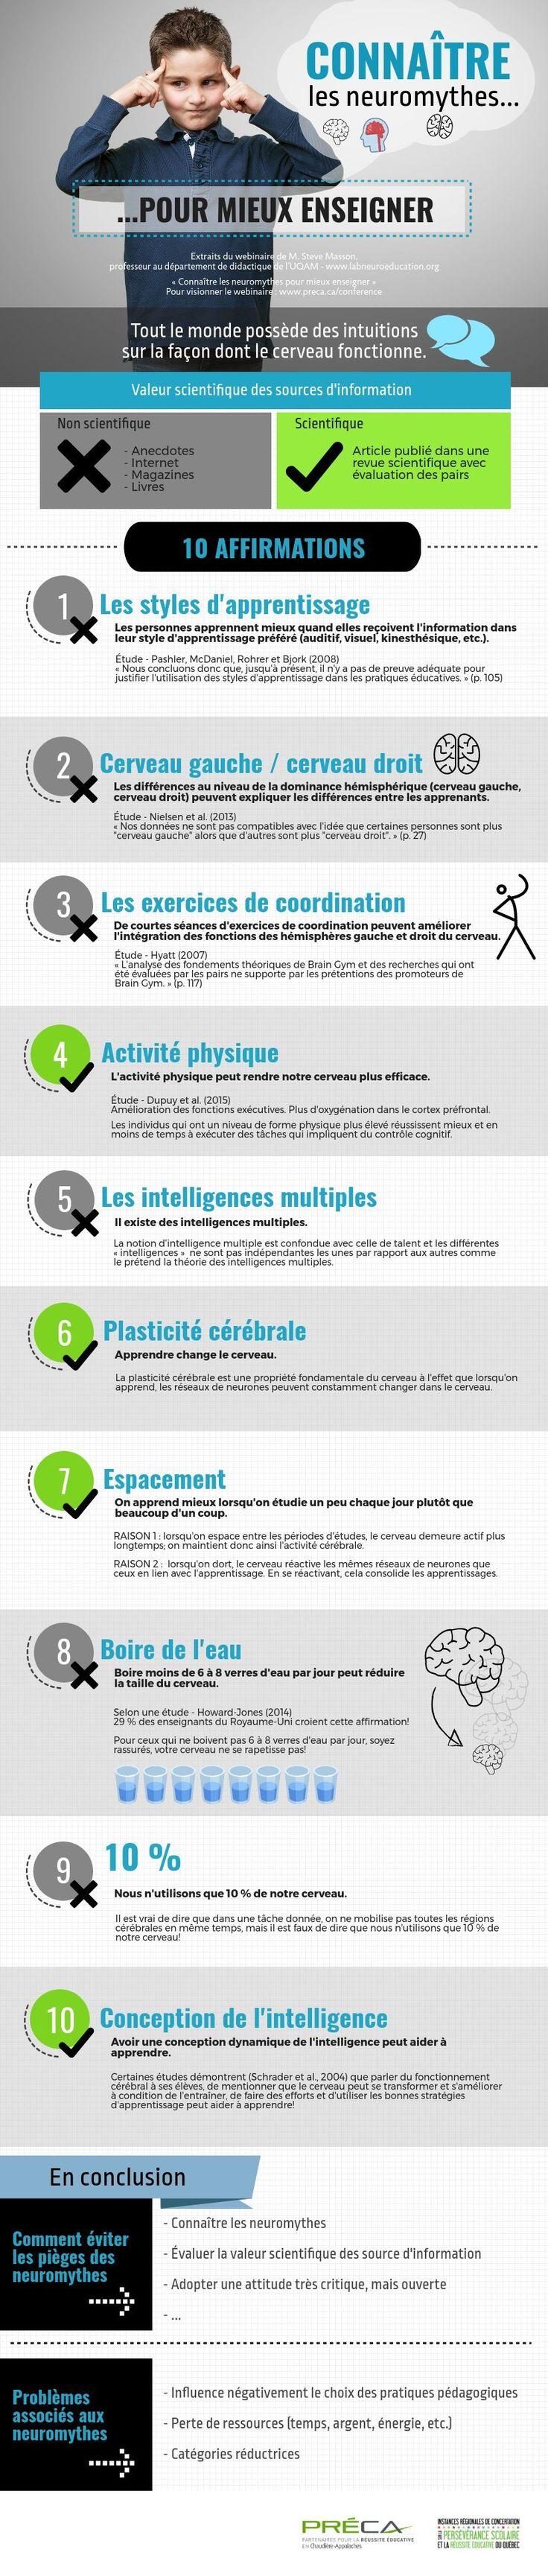 Les neuromythes | Piktochart Visual Editor